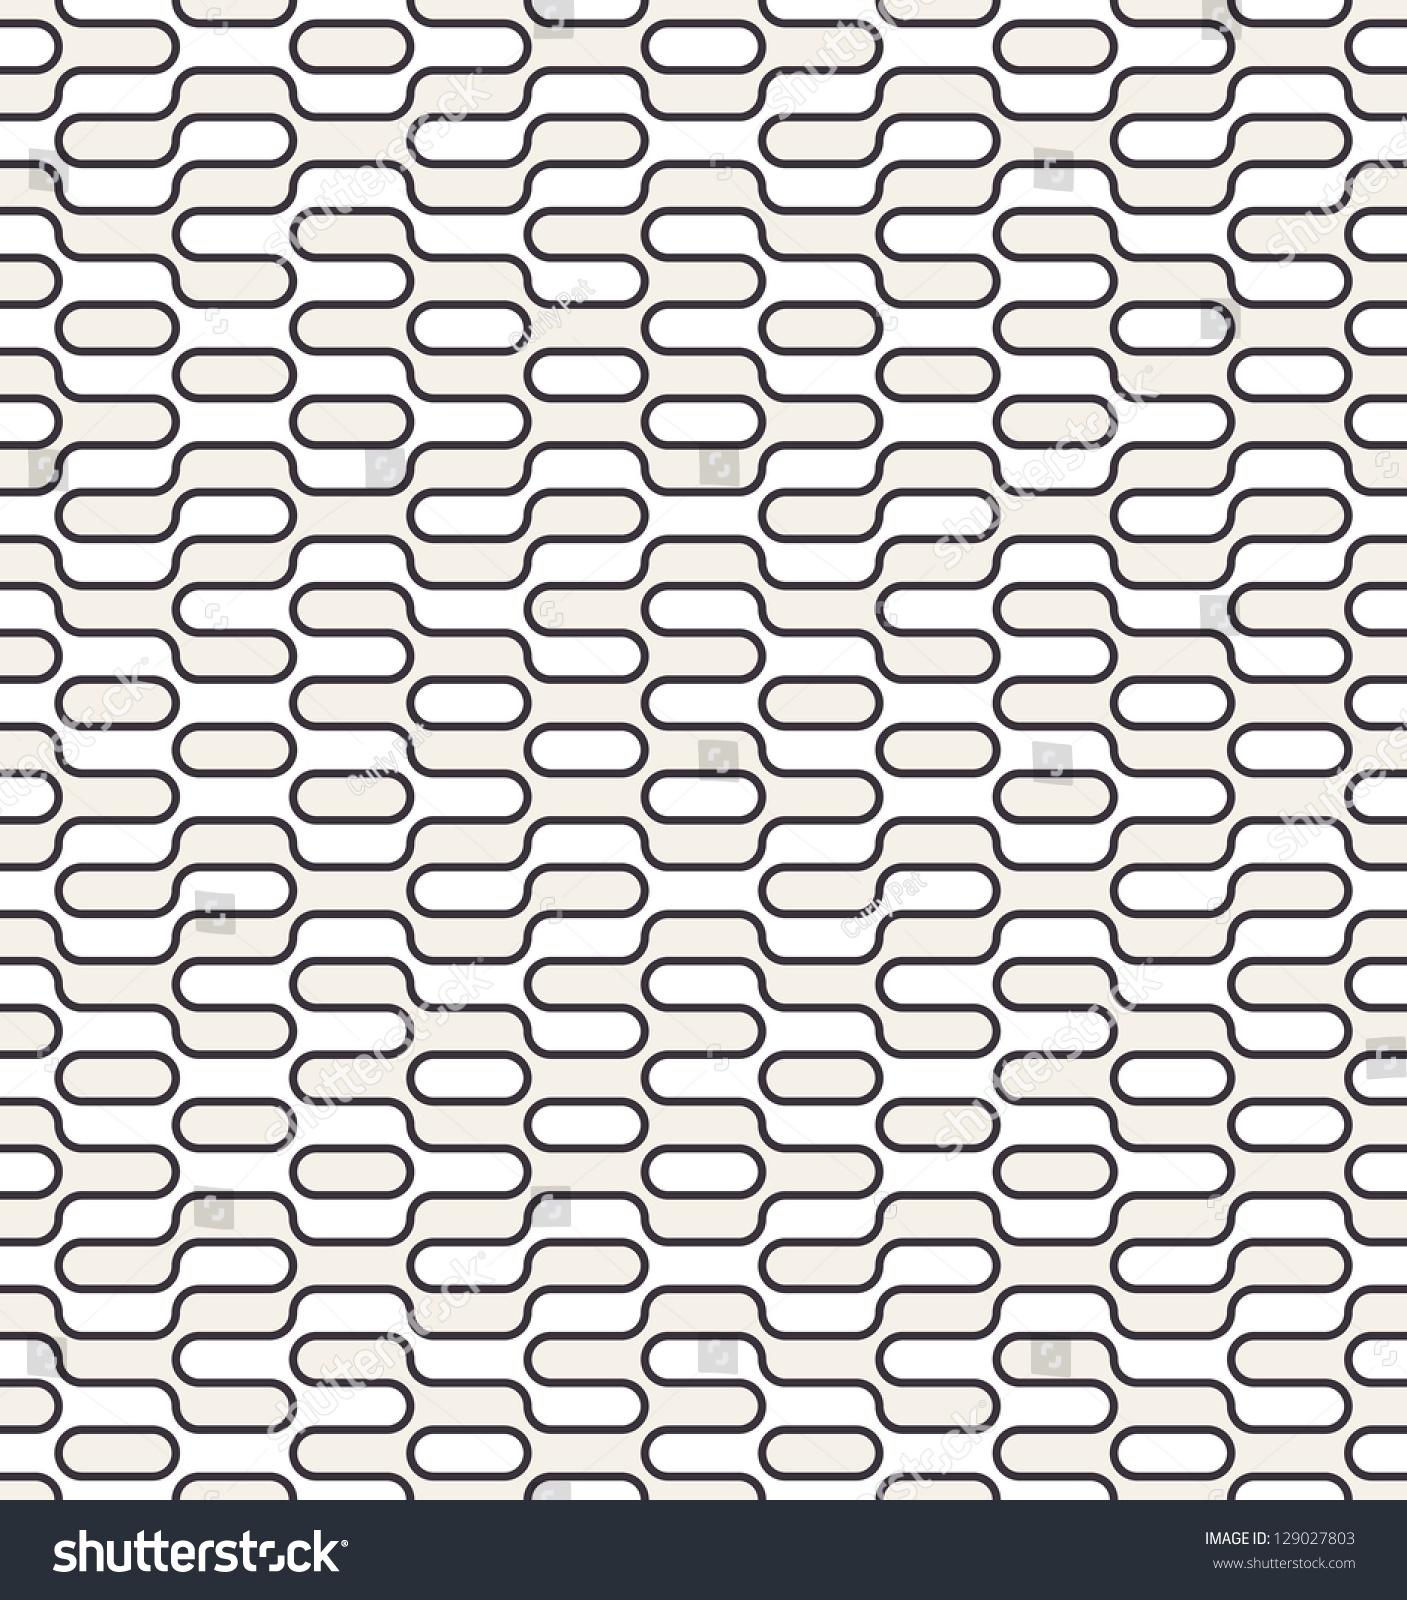 Seamless Grid Pattern Mesh Texture Repeating Mesh Stock